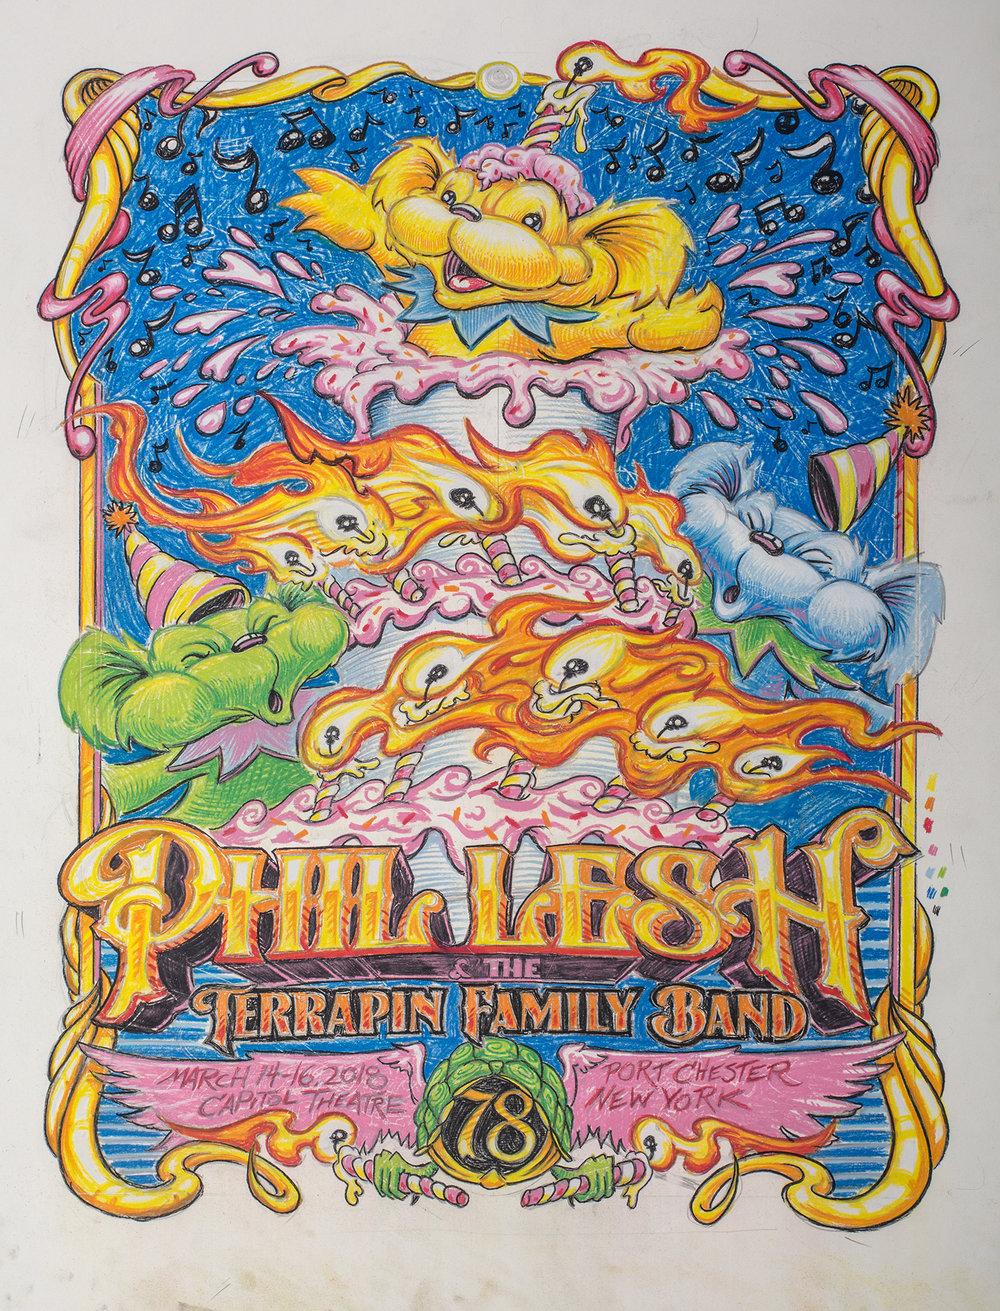 Phil Lesh 78th Birthday Celebration